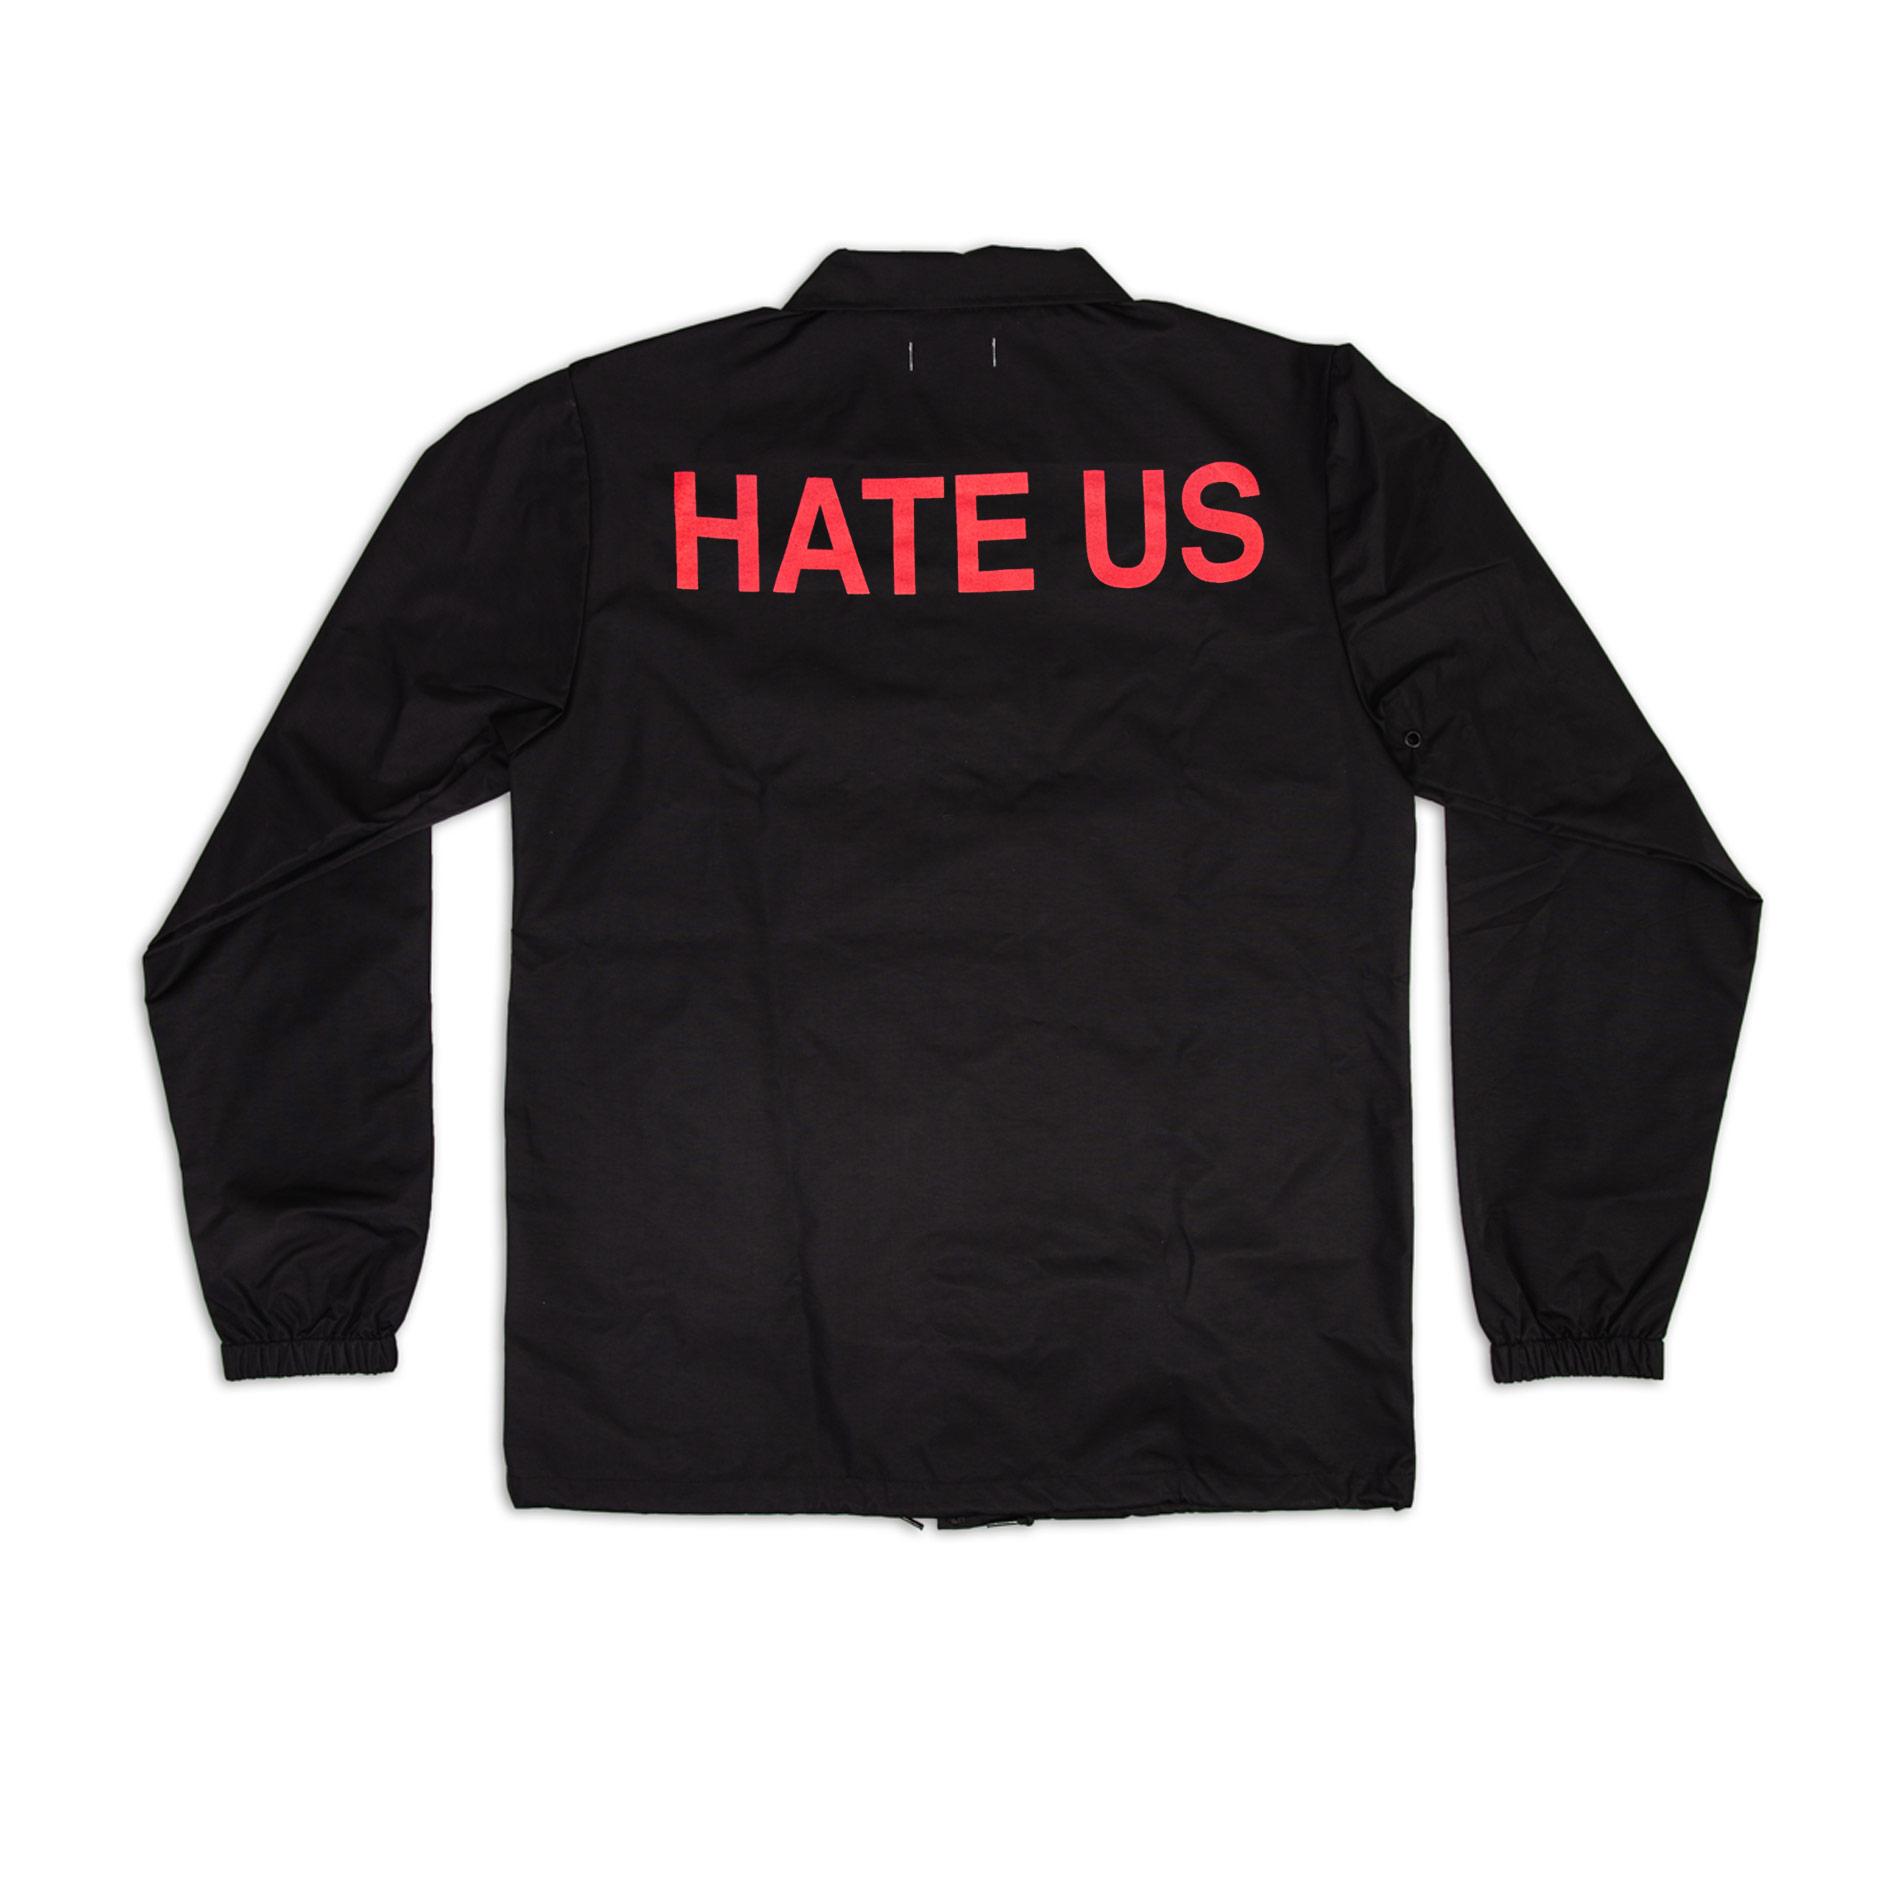 HATE US COACH JACKET